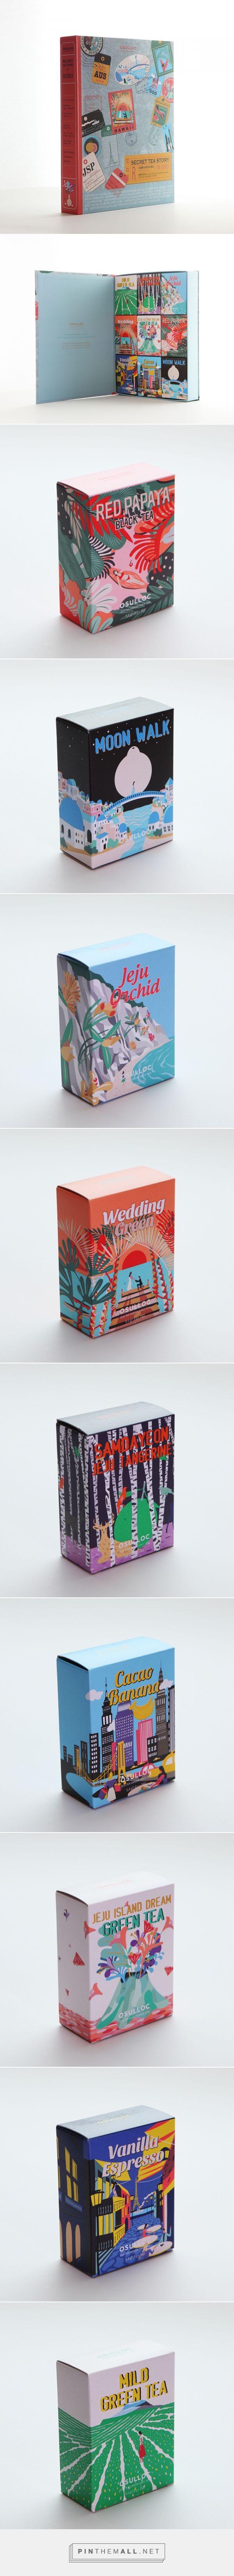 OSULLOC SECRET TEA STORY  | JOSEPH curated by Packaging Diva PD. Tea Packaging from around the world.  오설록 시크릿 티스토리 패키지 작업입니다.